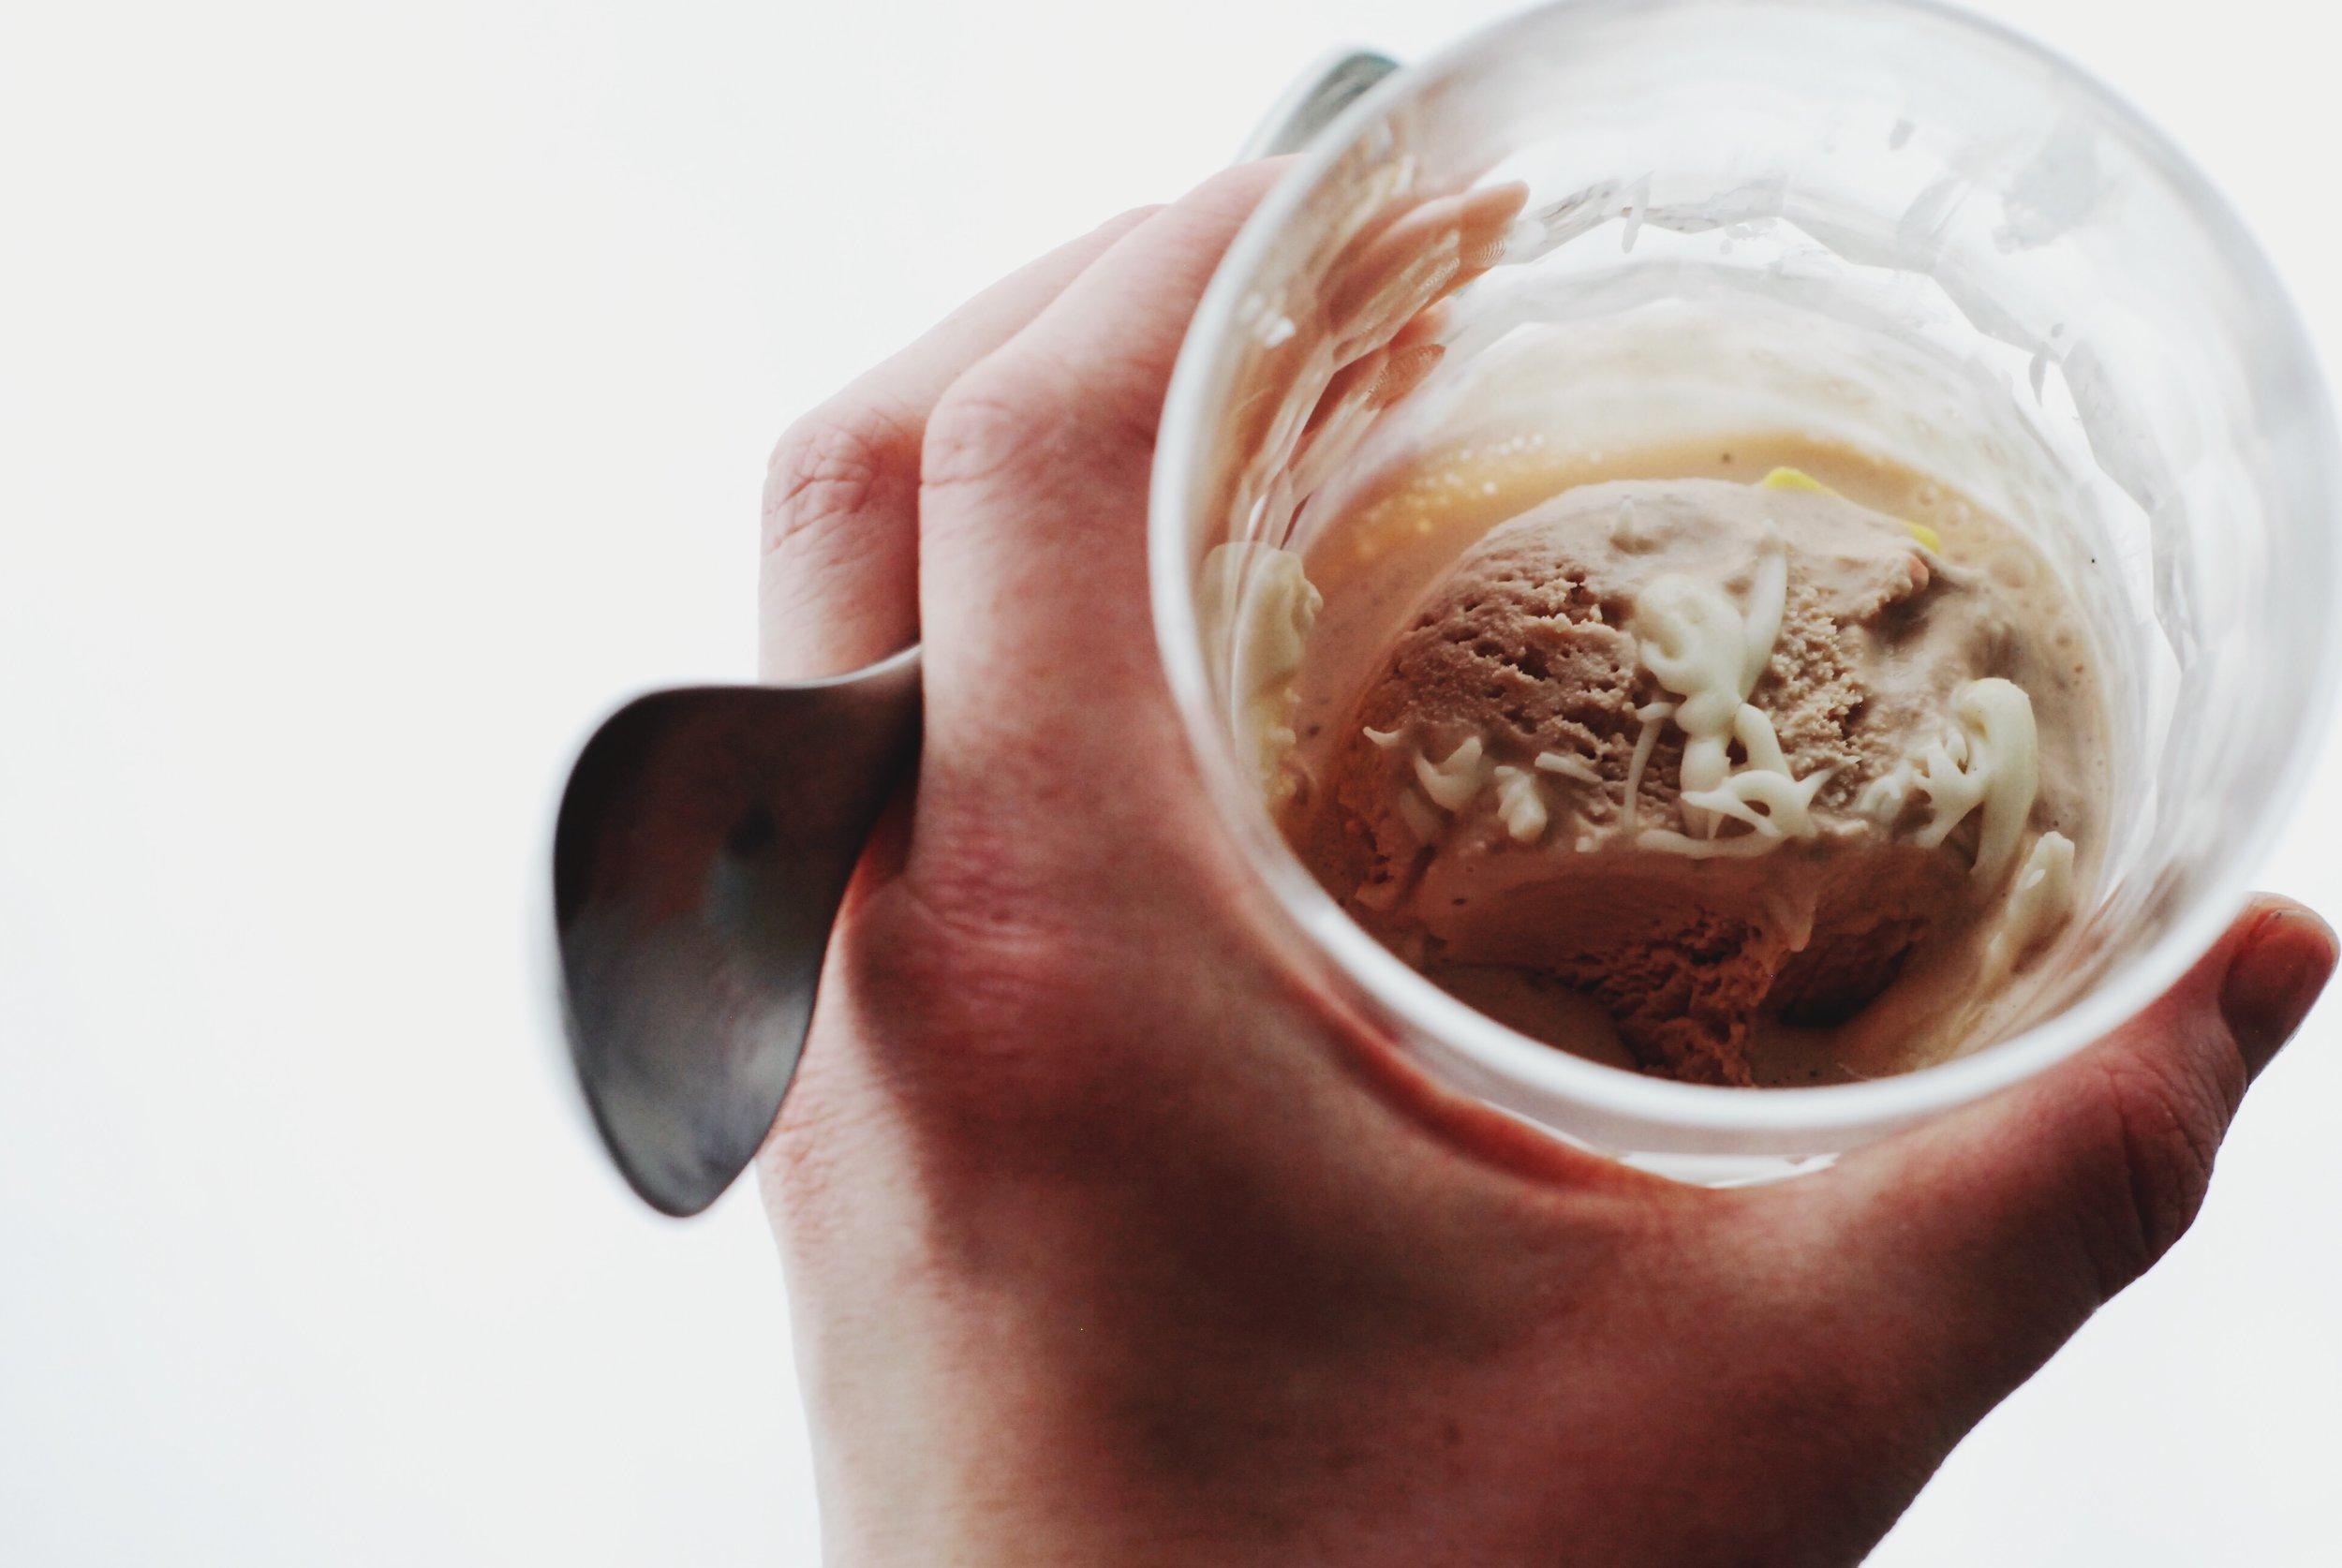 St. Patrick's Day Irish Cream ice cream from Earnest + authentic Irish whiskey glaze